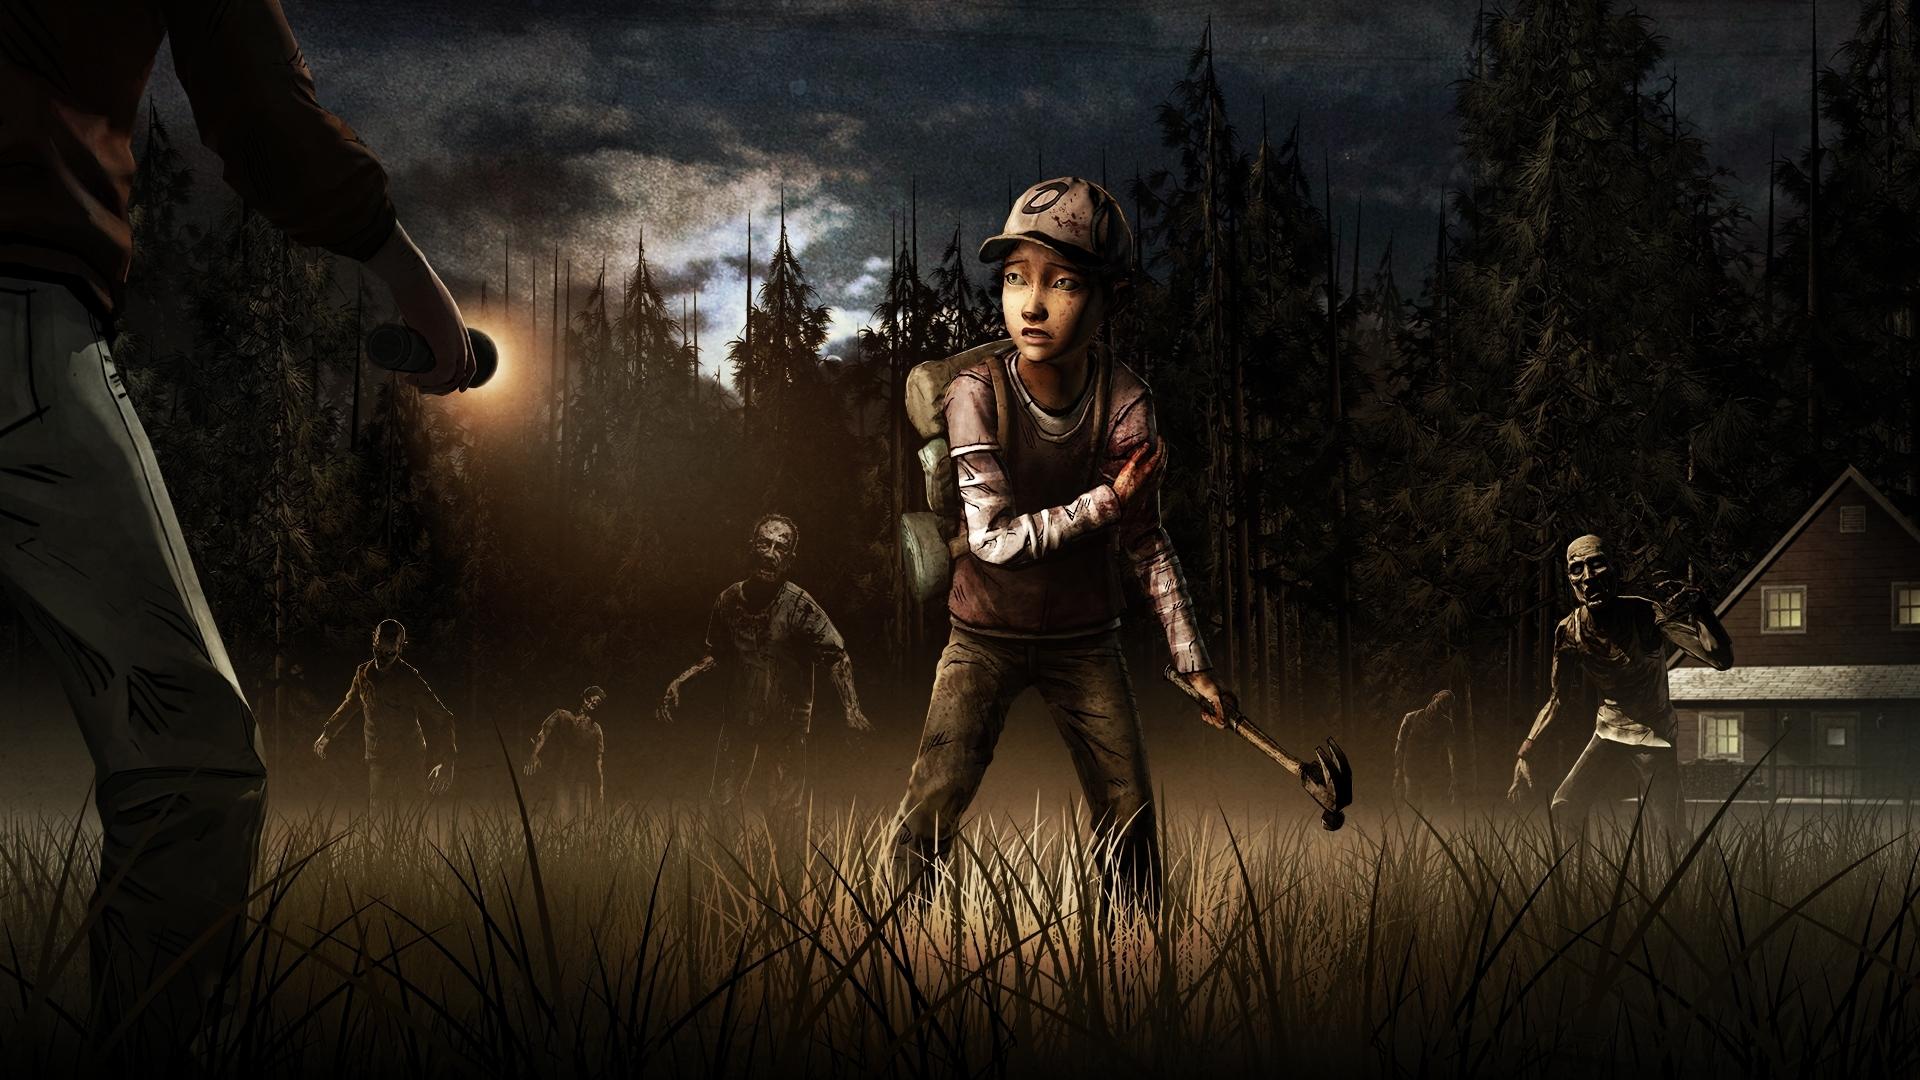 the walking dead: the game season 2 full hd fond d'écran and arrière